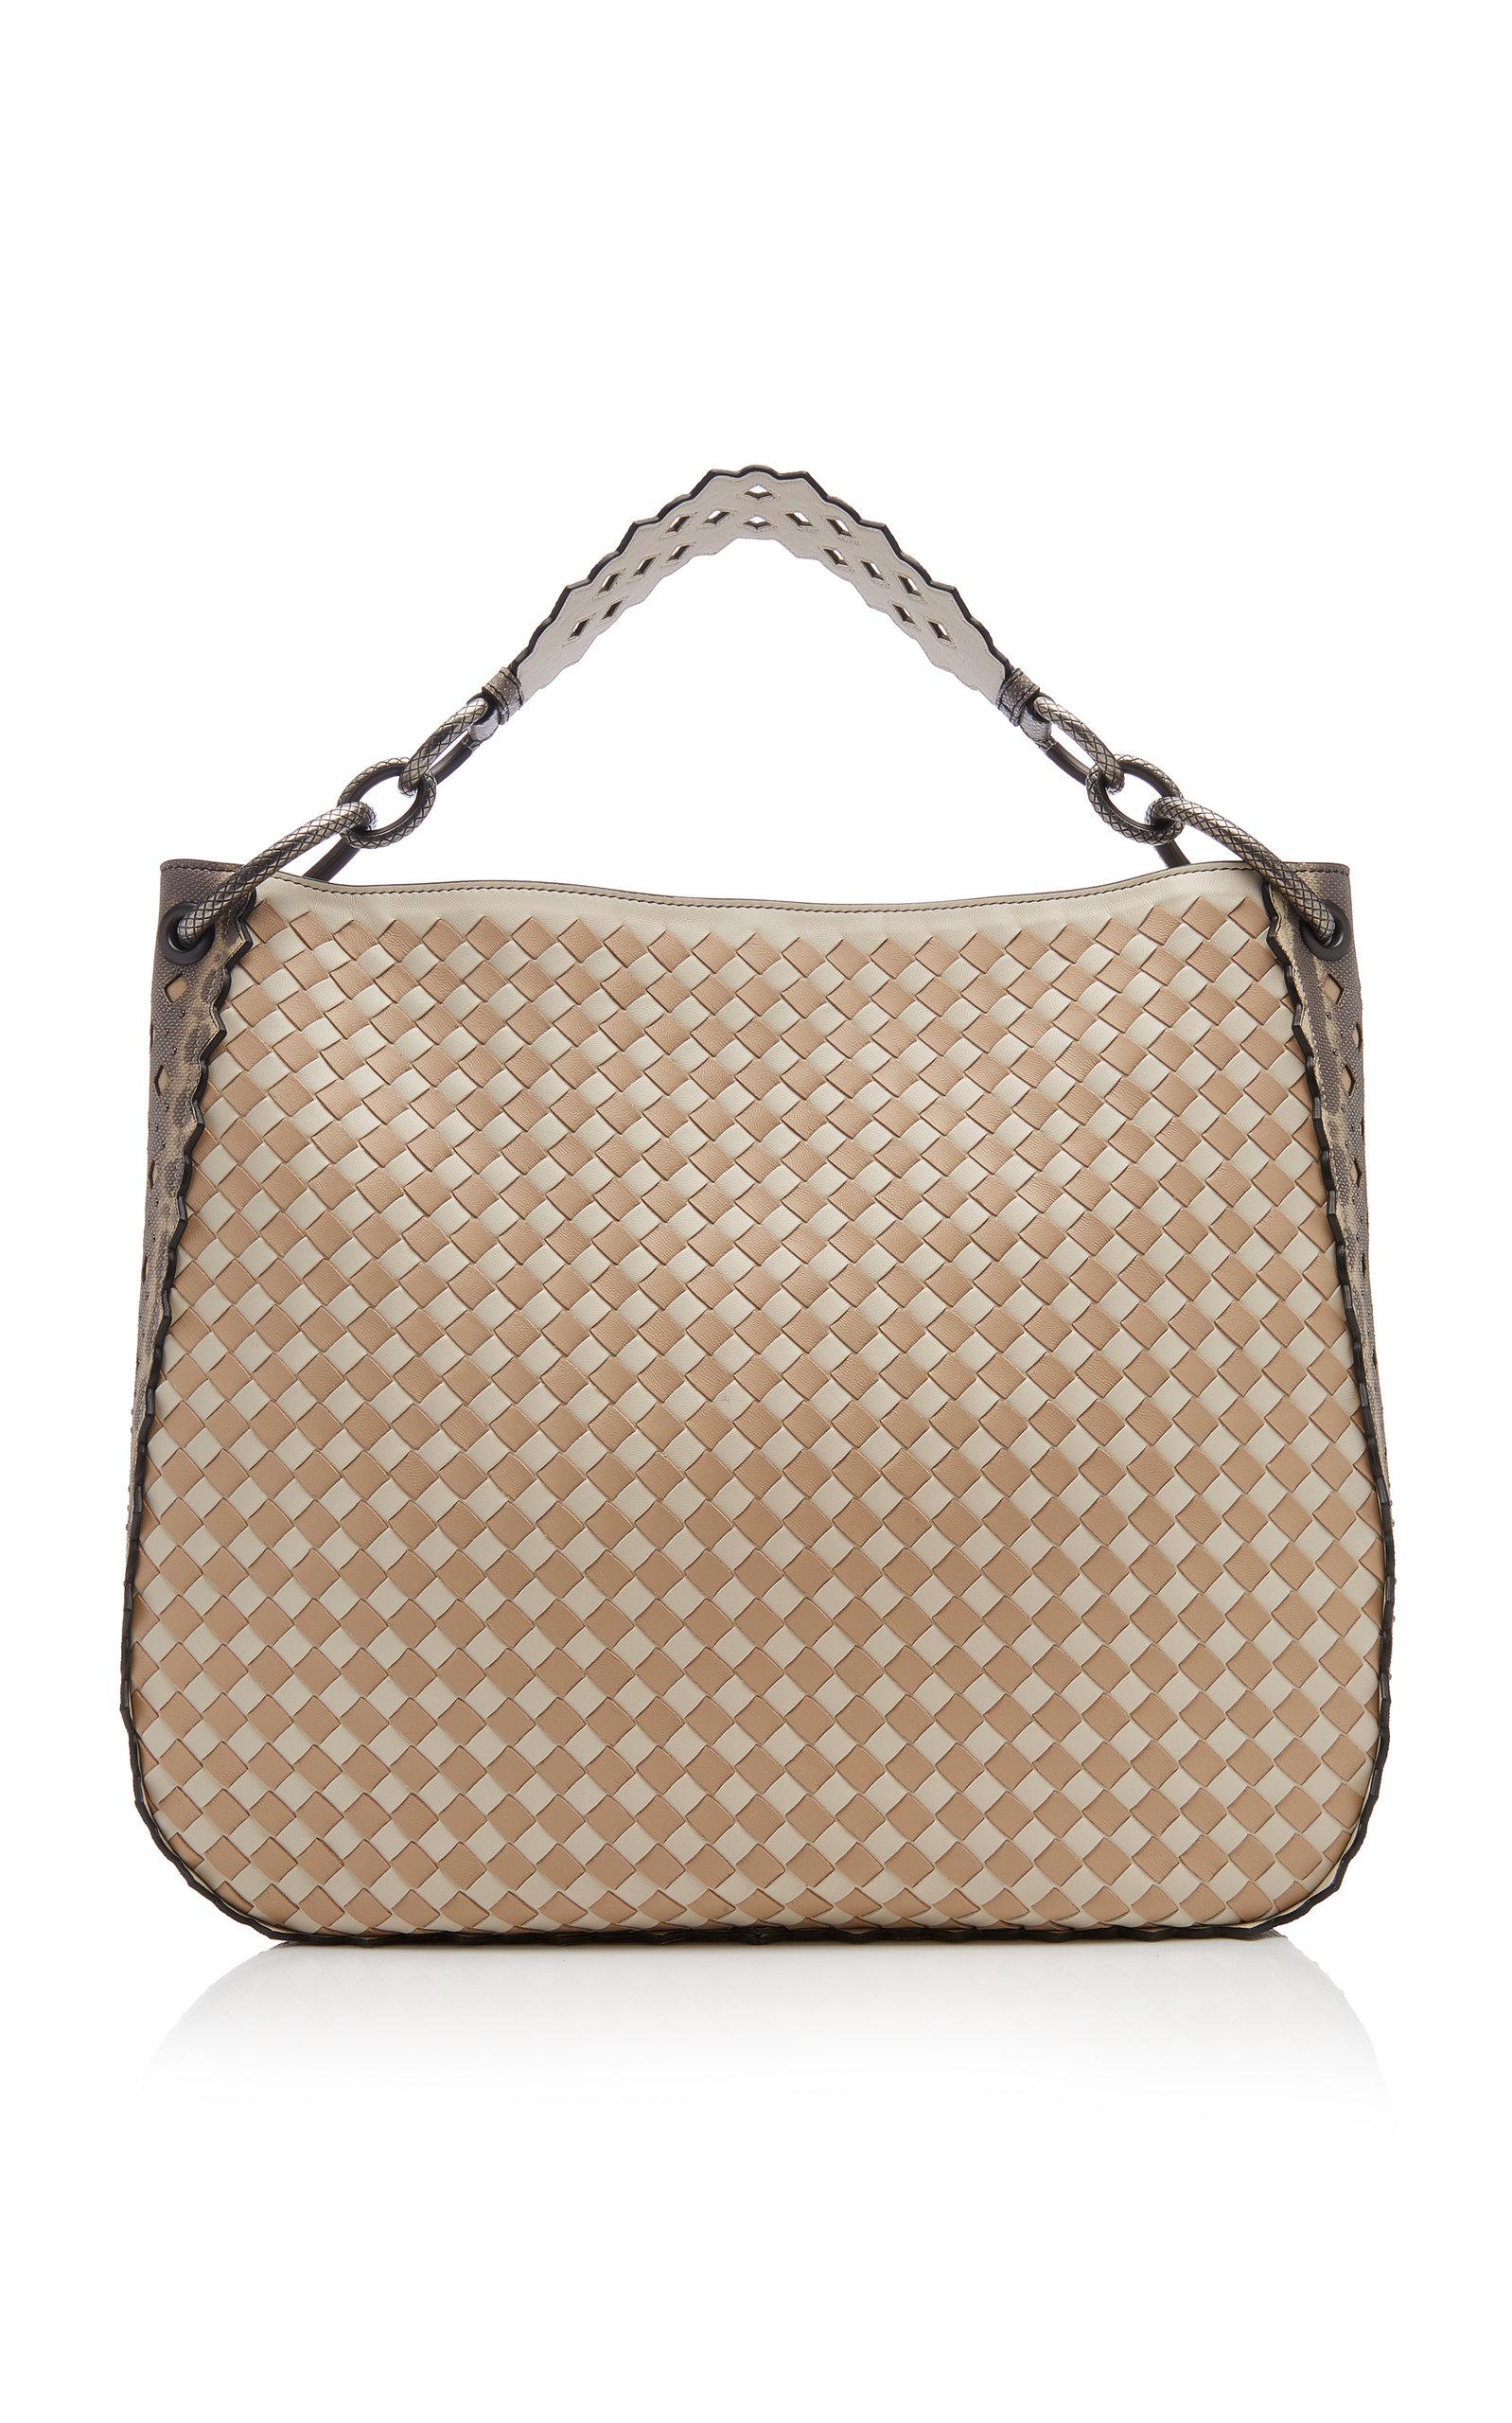 ee593bd447 Bottega VenetaLoop Medium Hobo Leather Bag. CLOSE. Loading